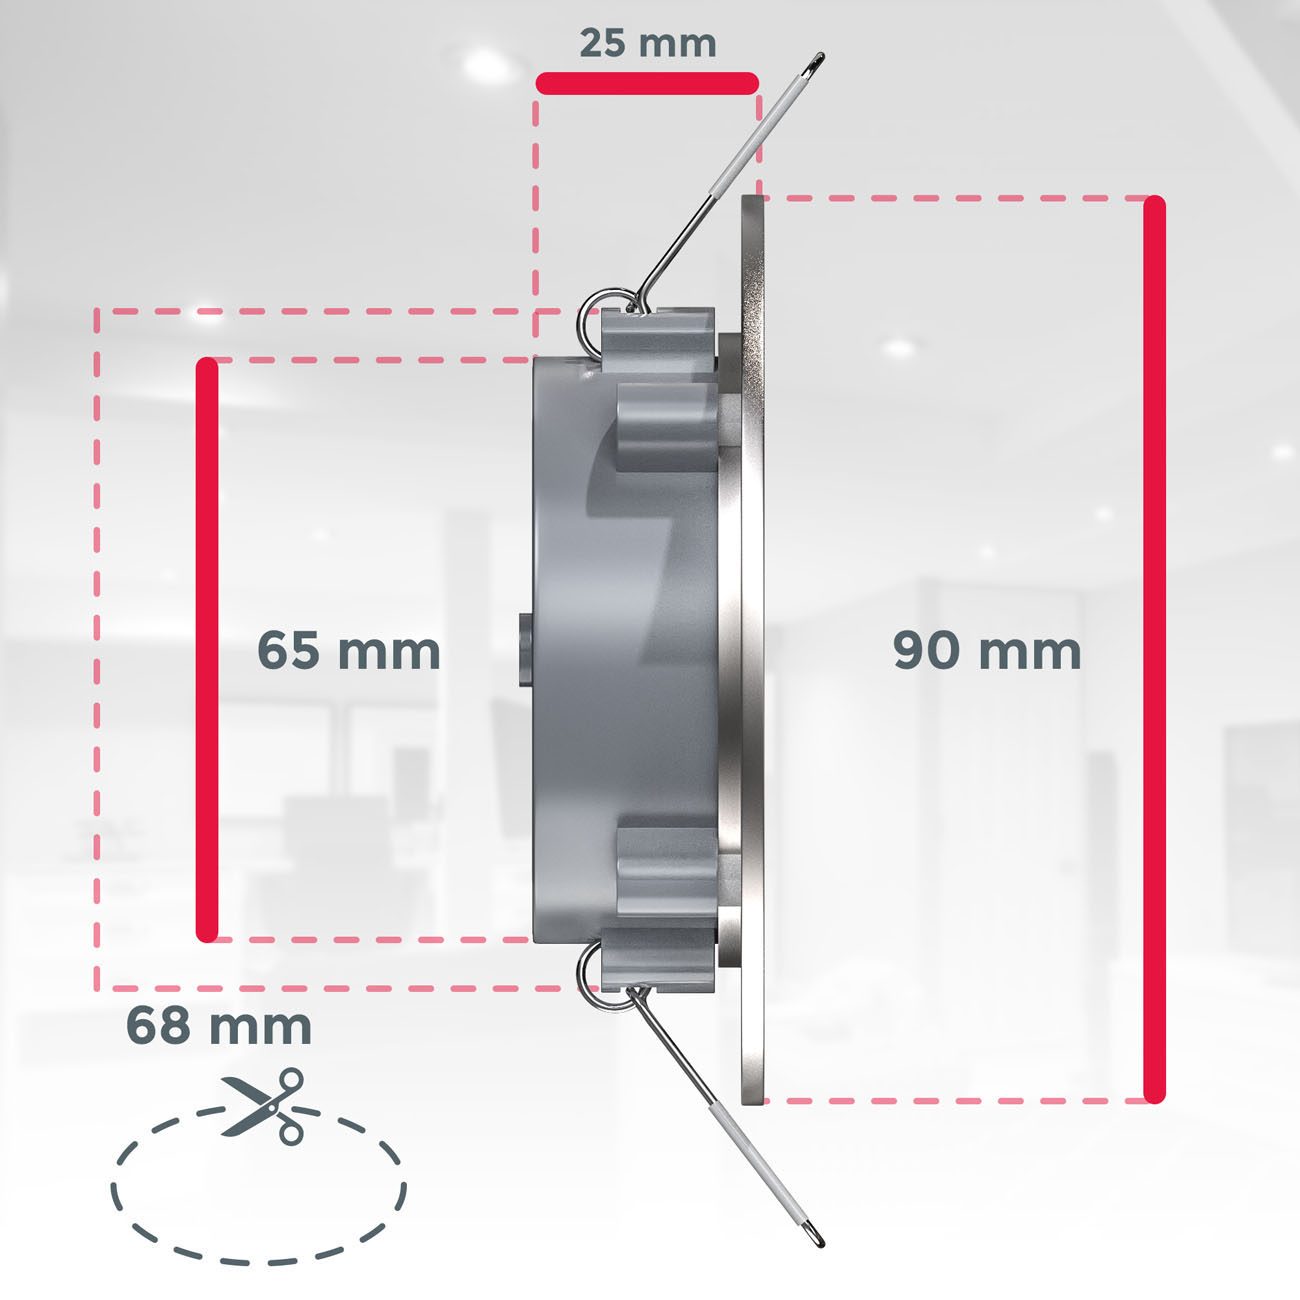 LED Einbaustrahler | Bad Einbauleuchte 3er SET | ultra flach 5W IP44 dimmbar - 7